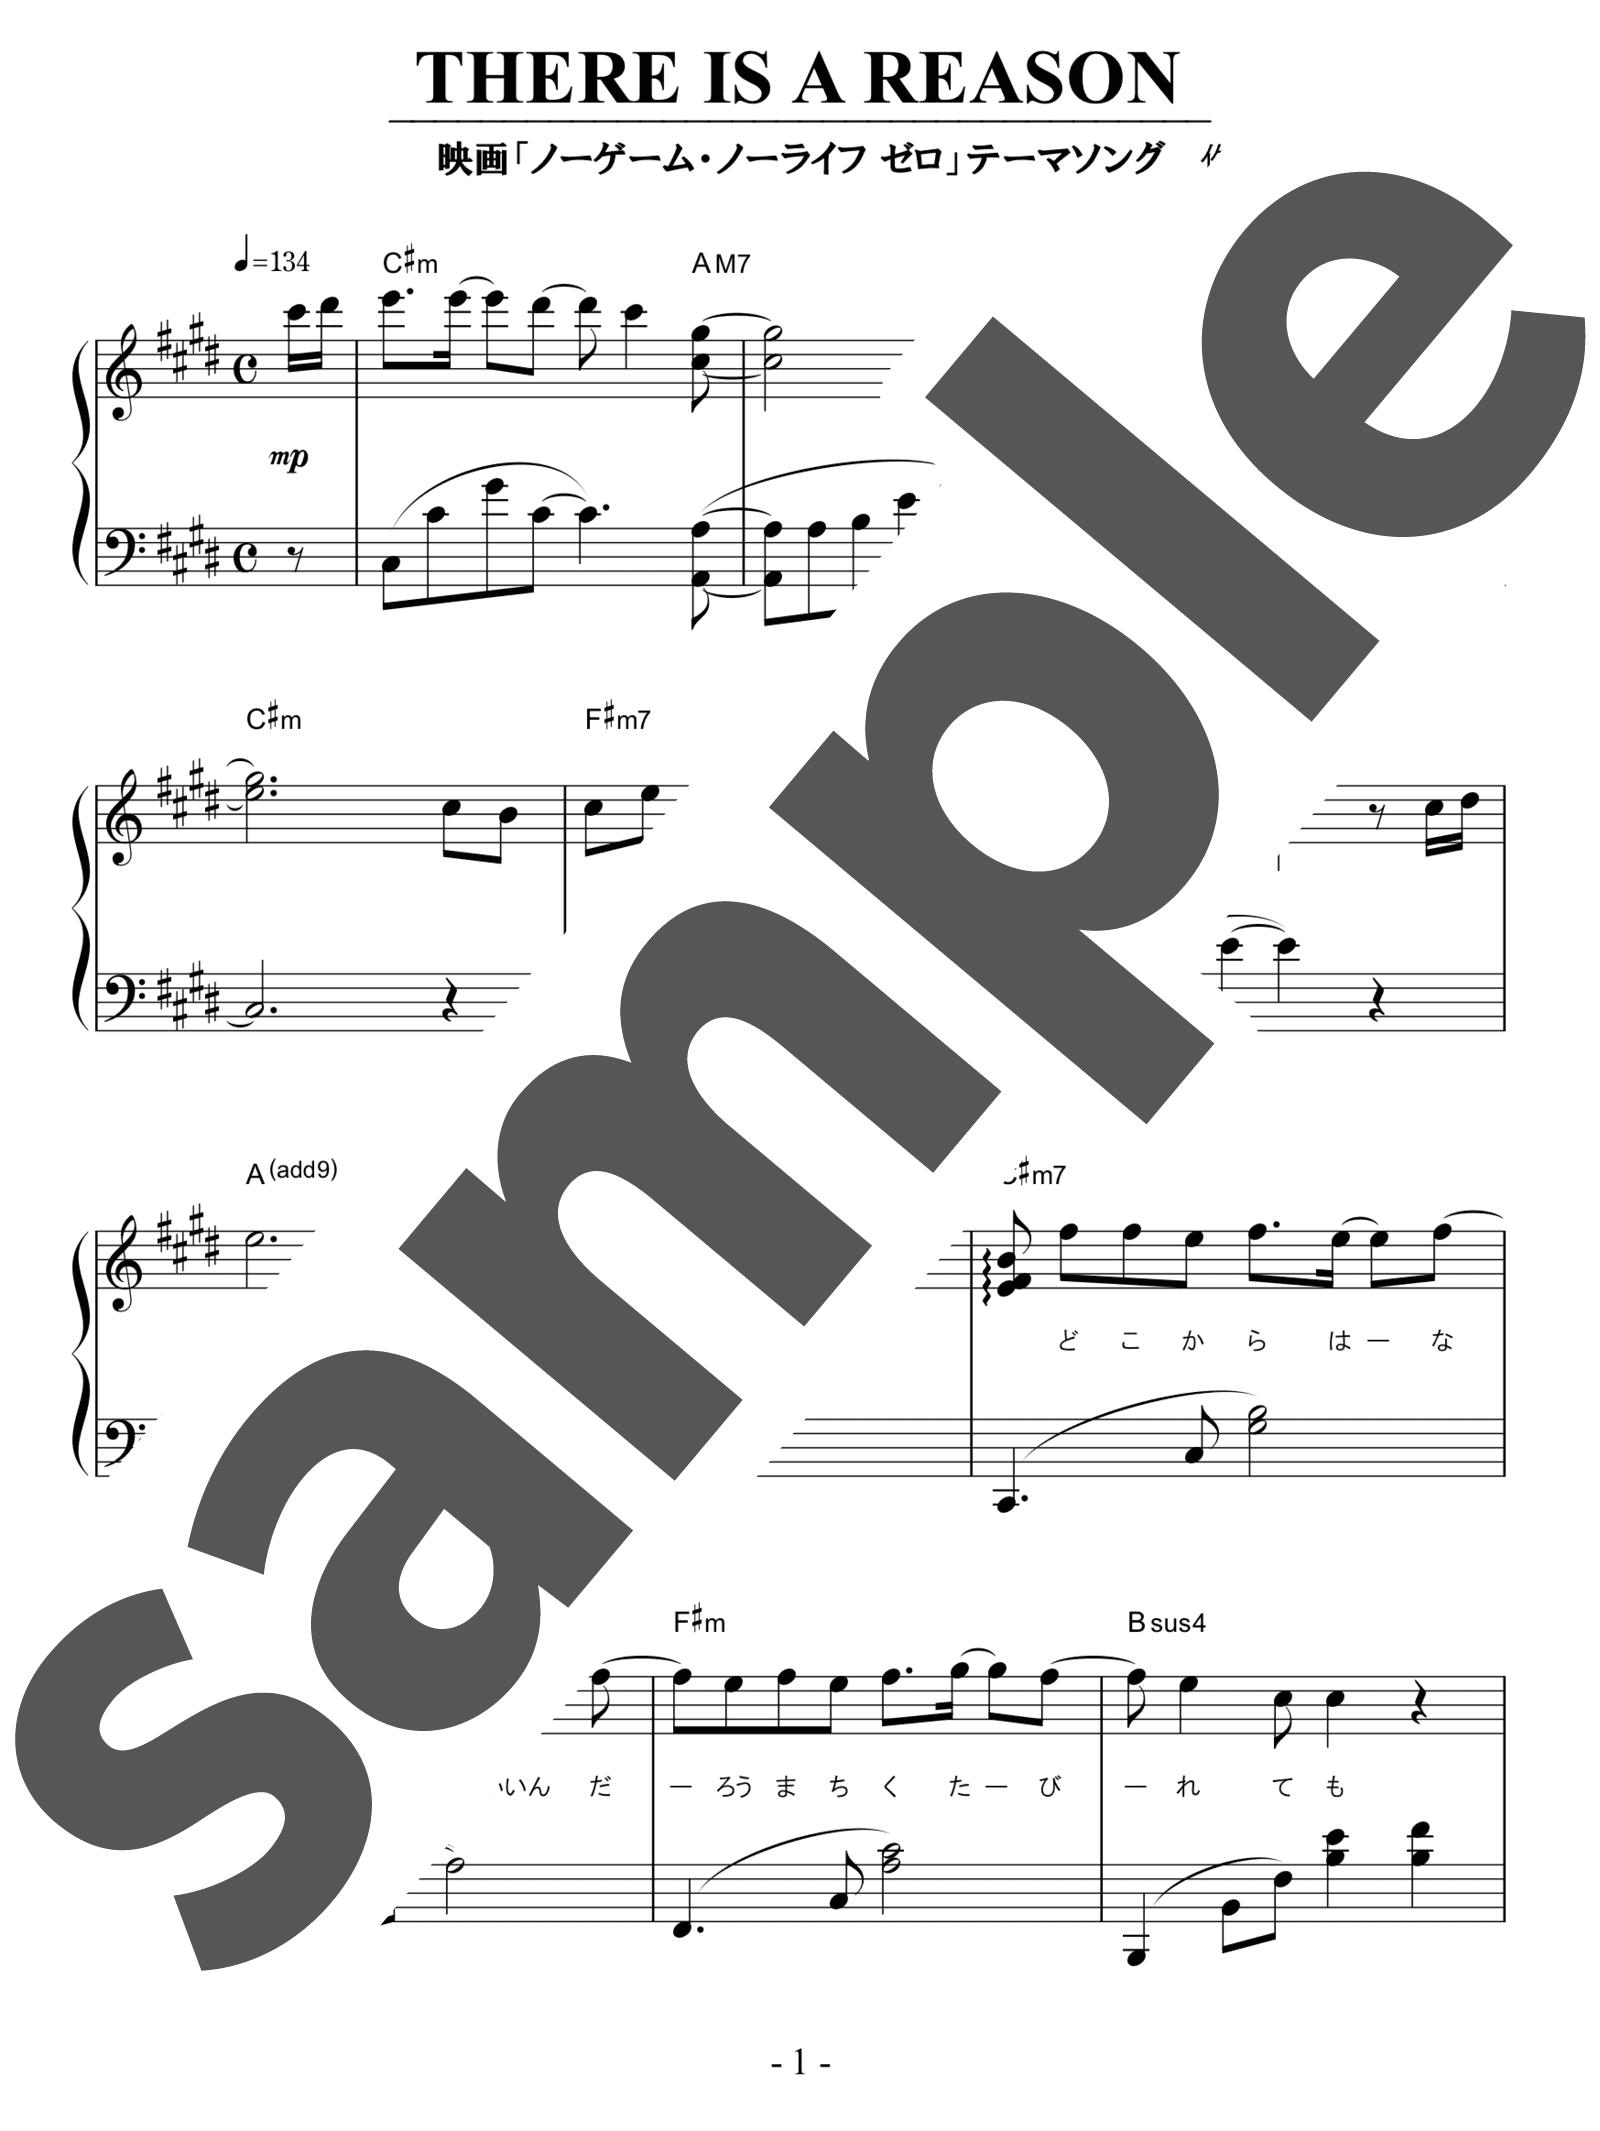 「THERE IS A REASON」のサンプル楽譜